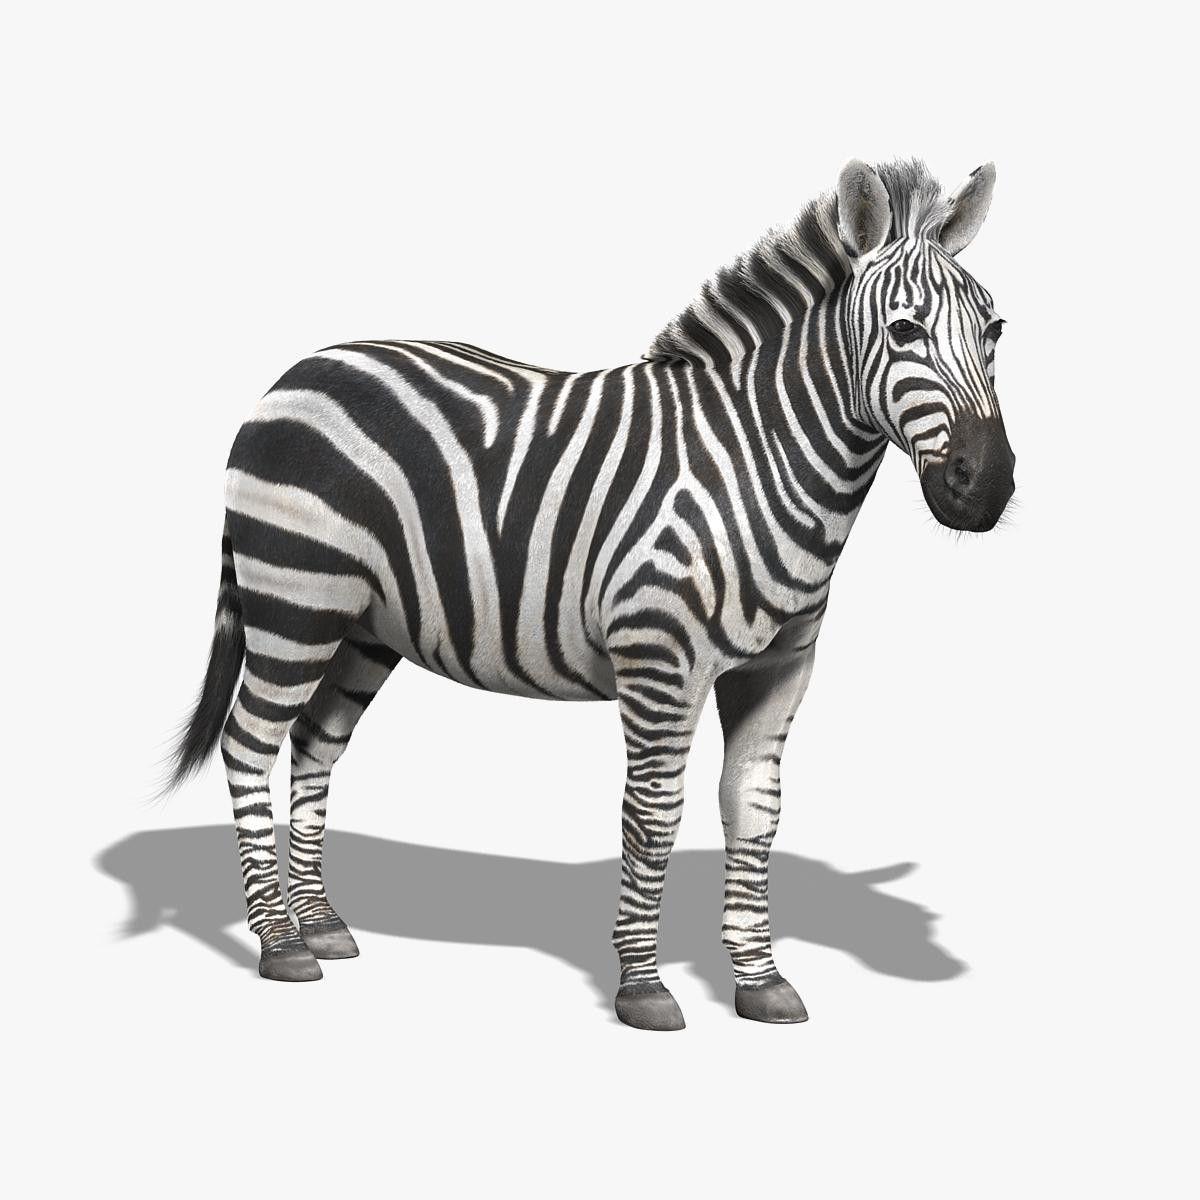 3dsmax Photorealistic Zebra Fur Zebra Green Zebra Fur